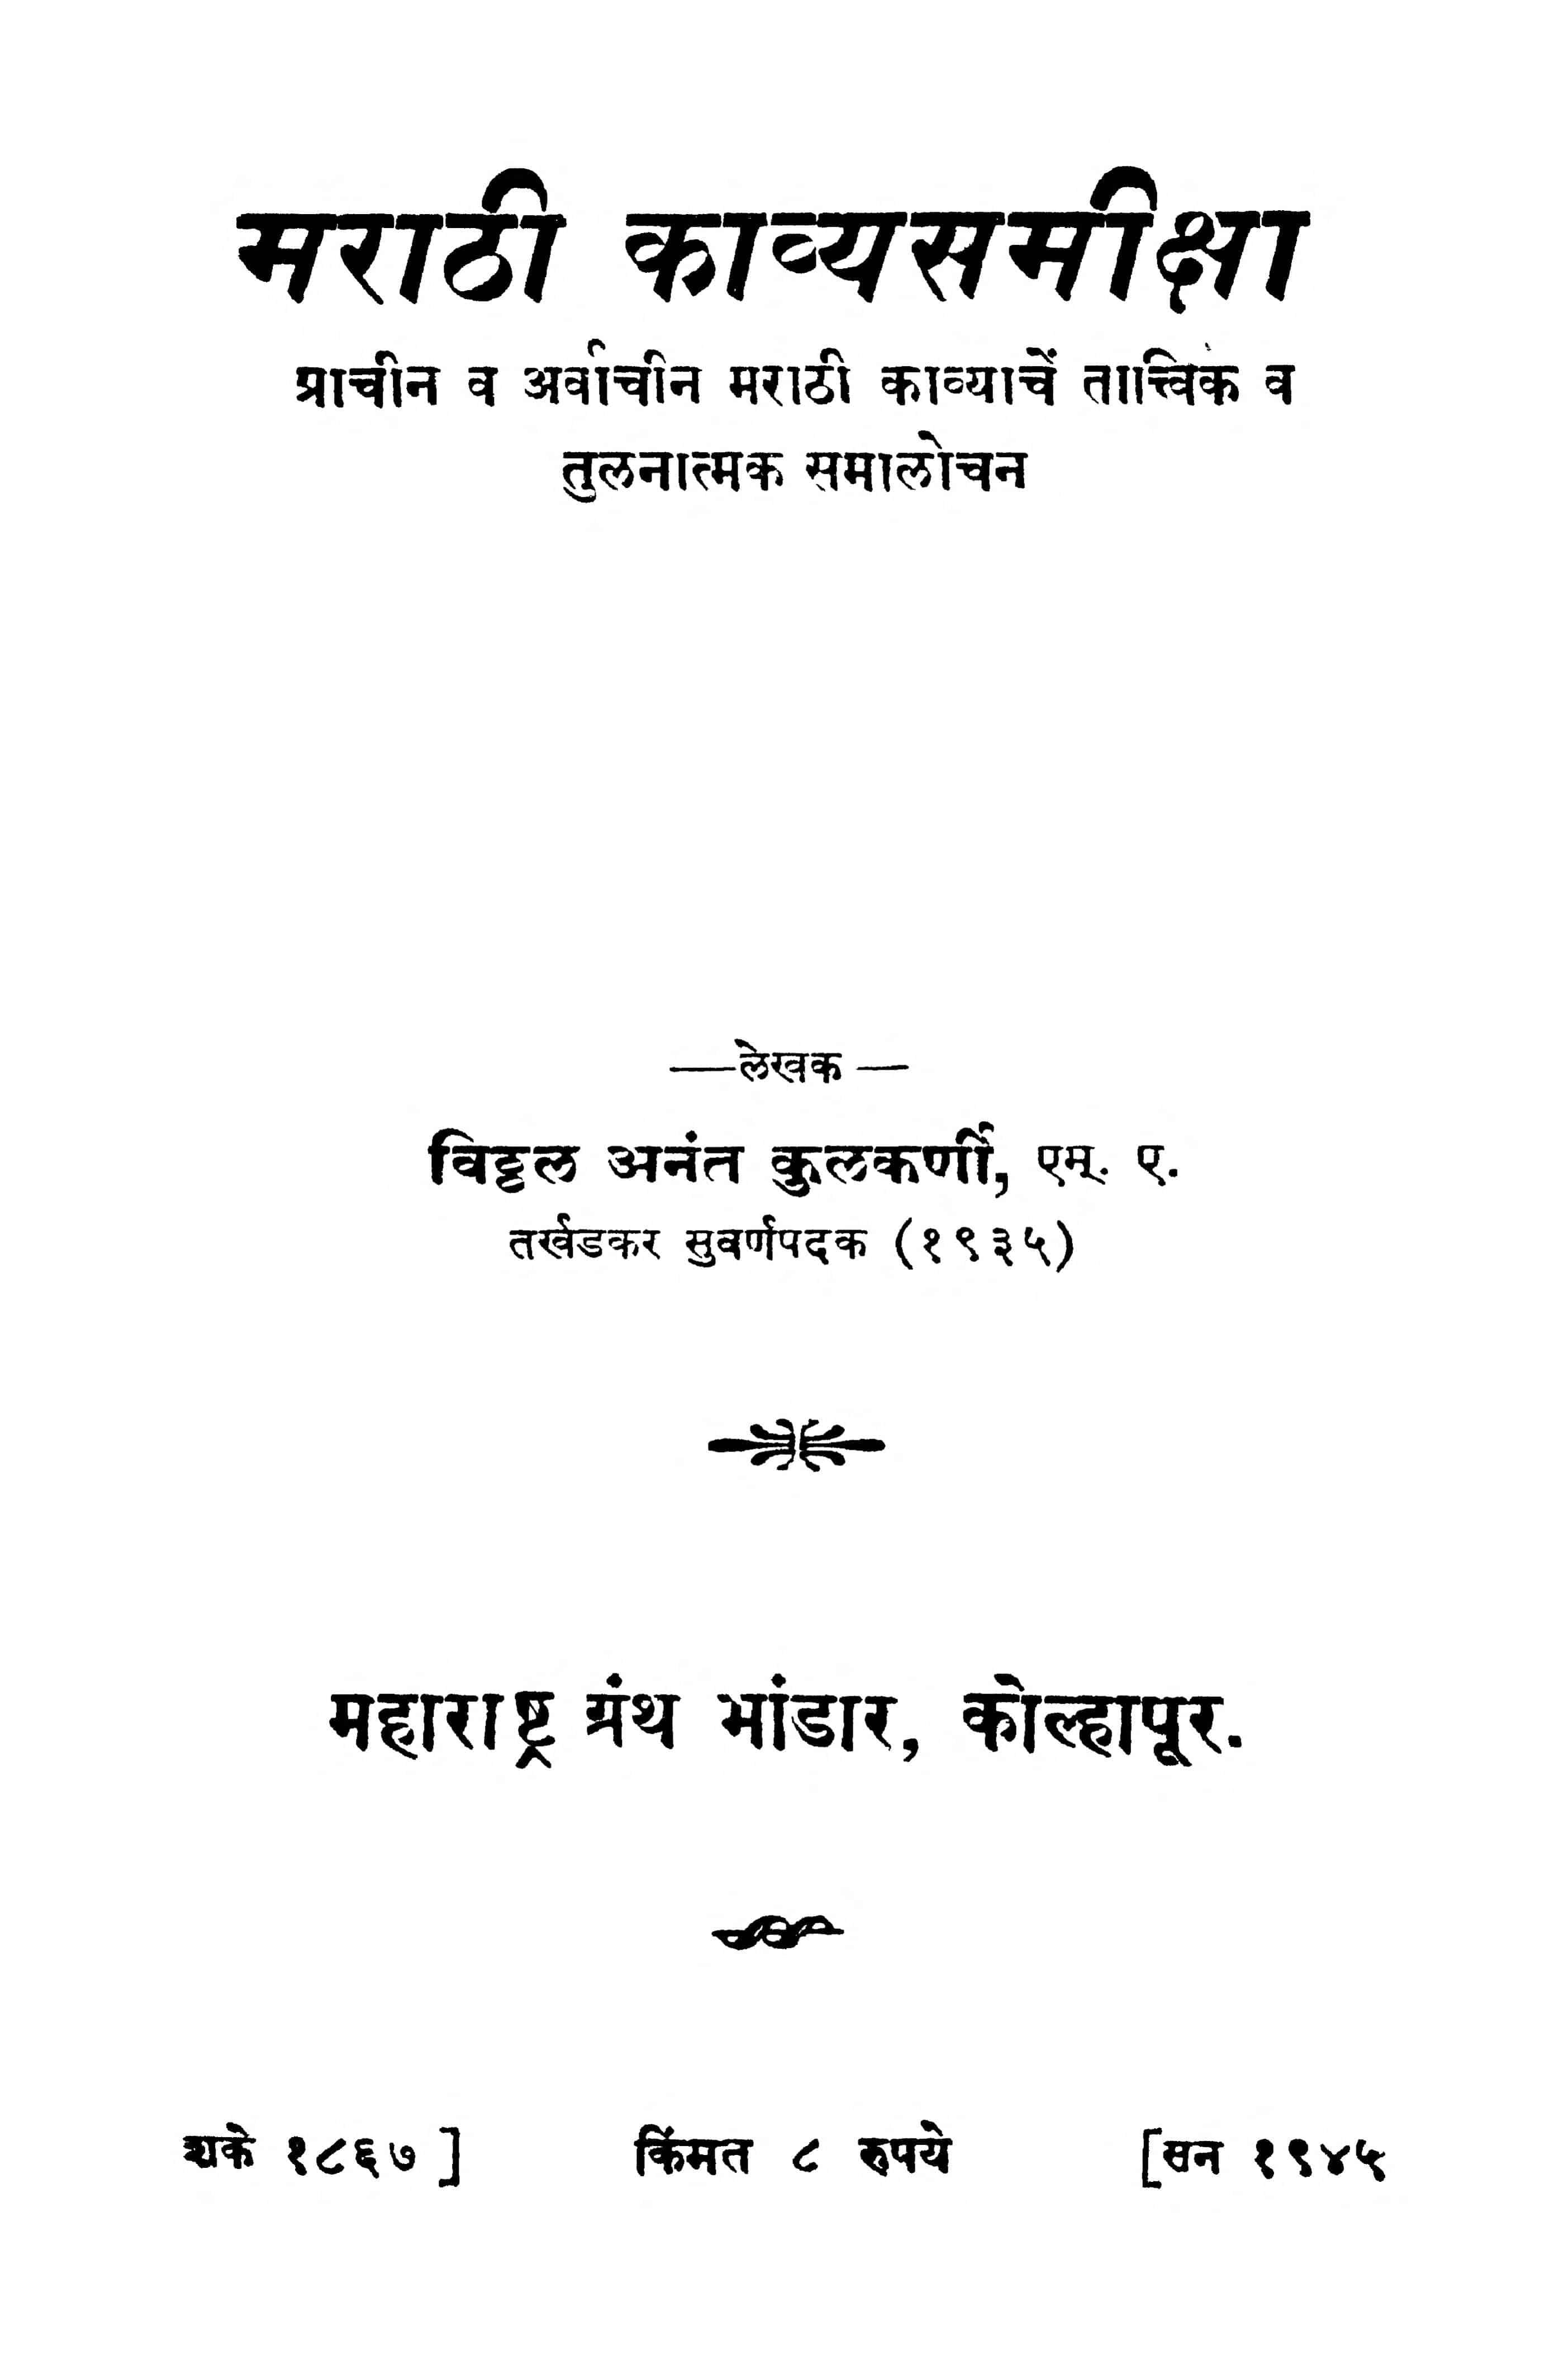 Maraathii Kaavyasamiiqsa by विठ्ठळ अनंत - Viththal Anant